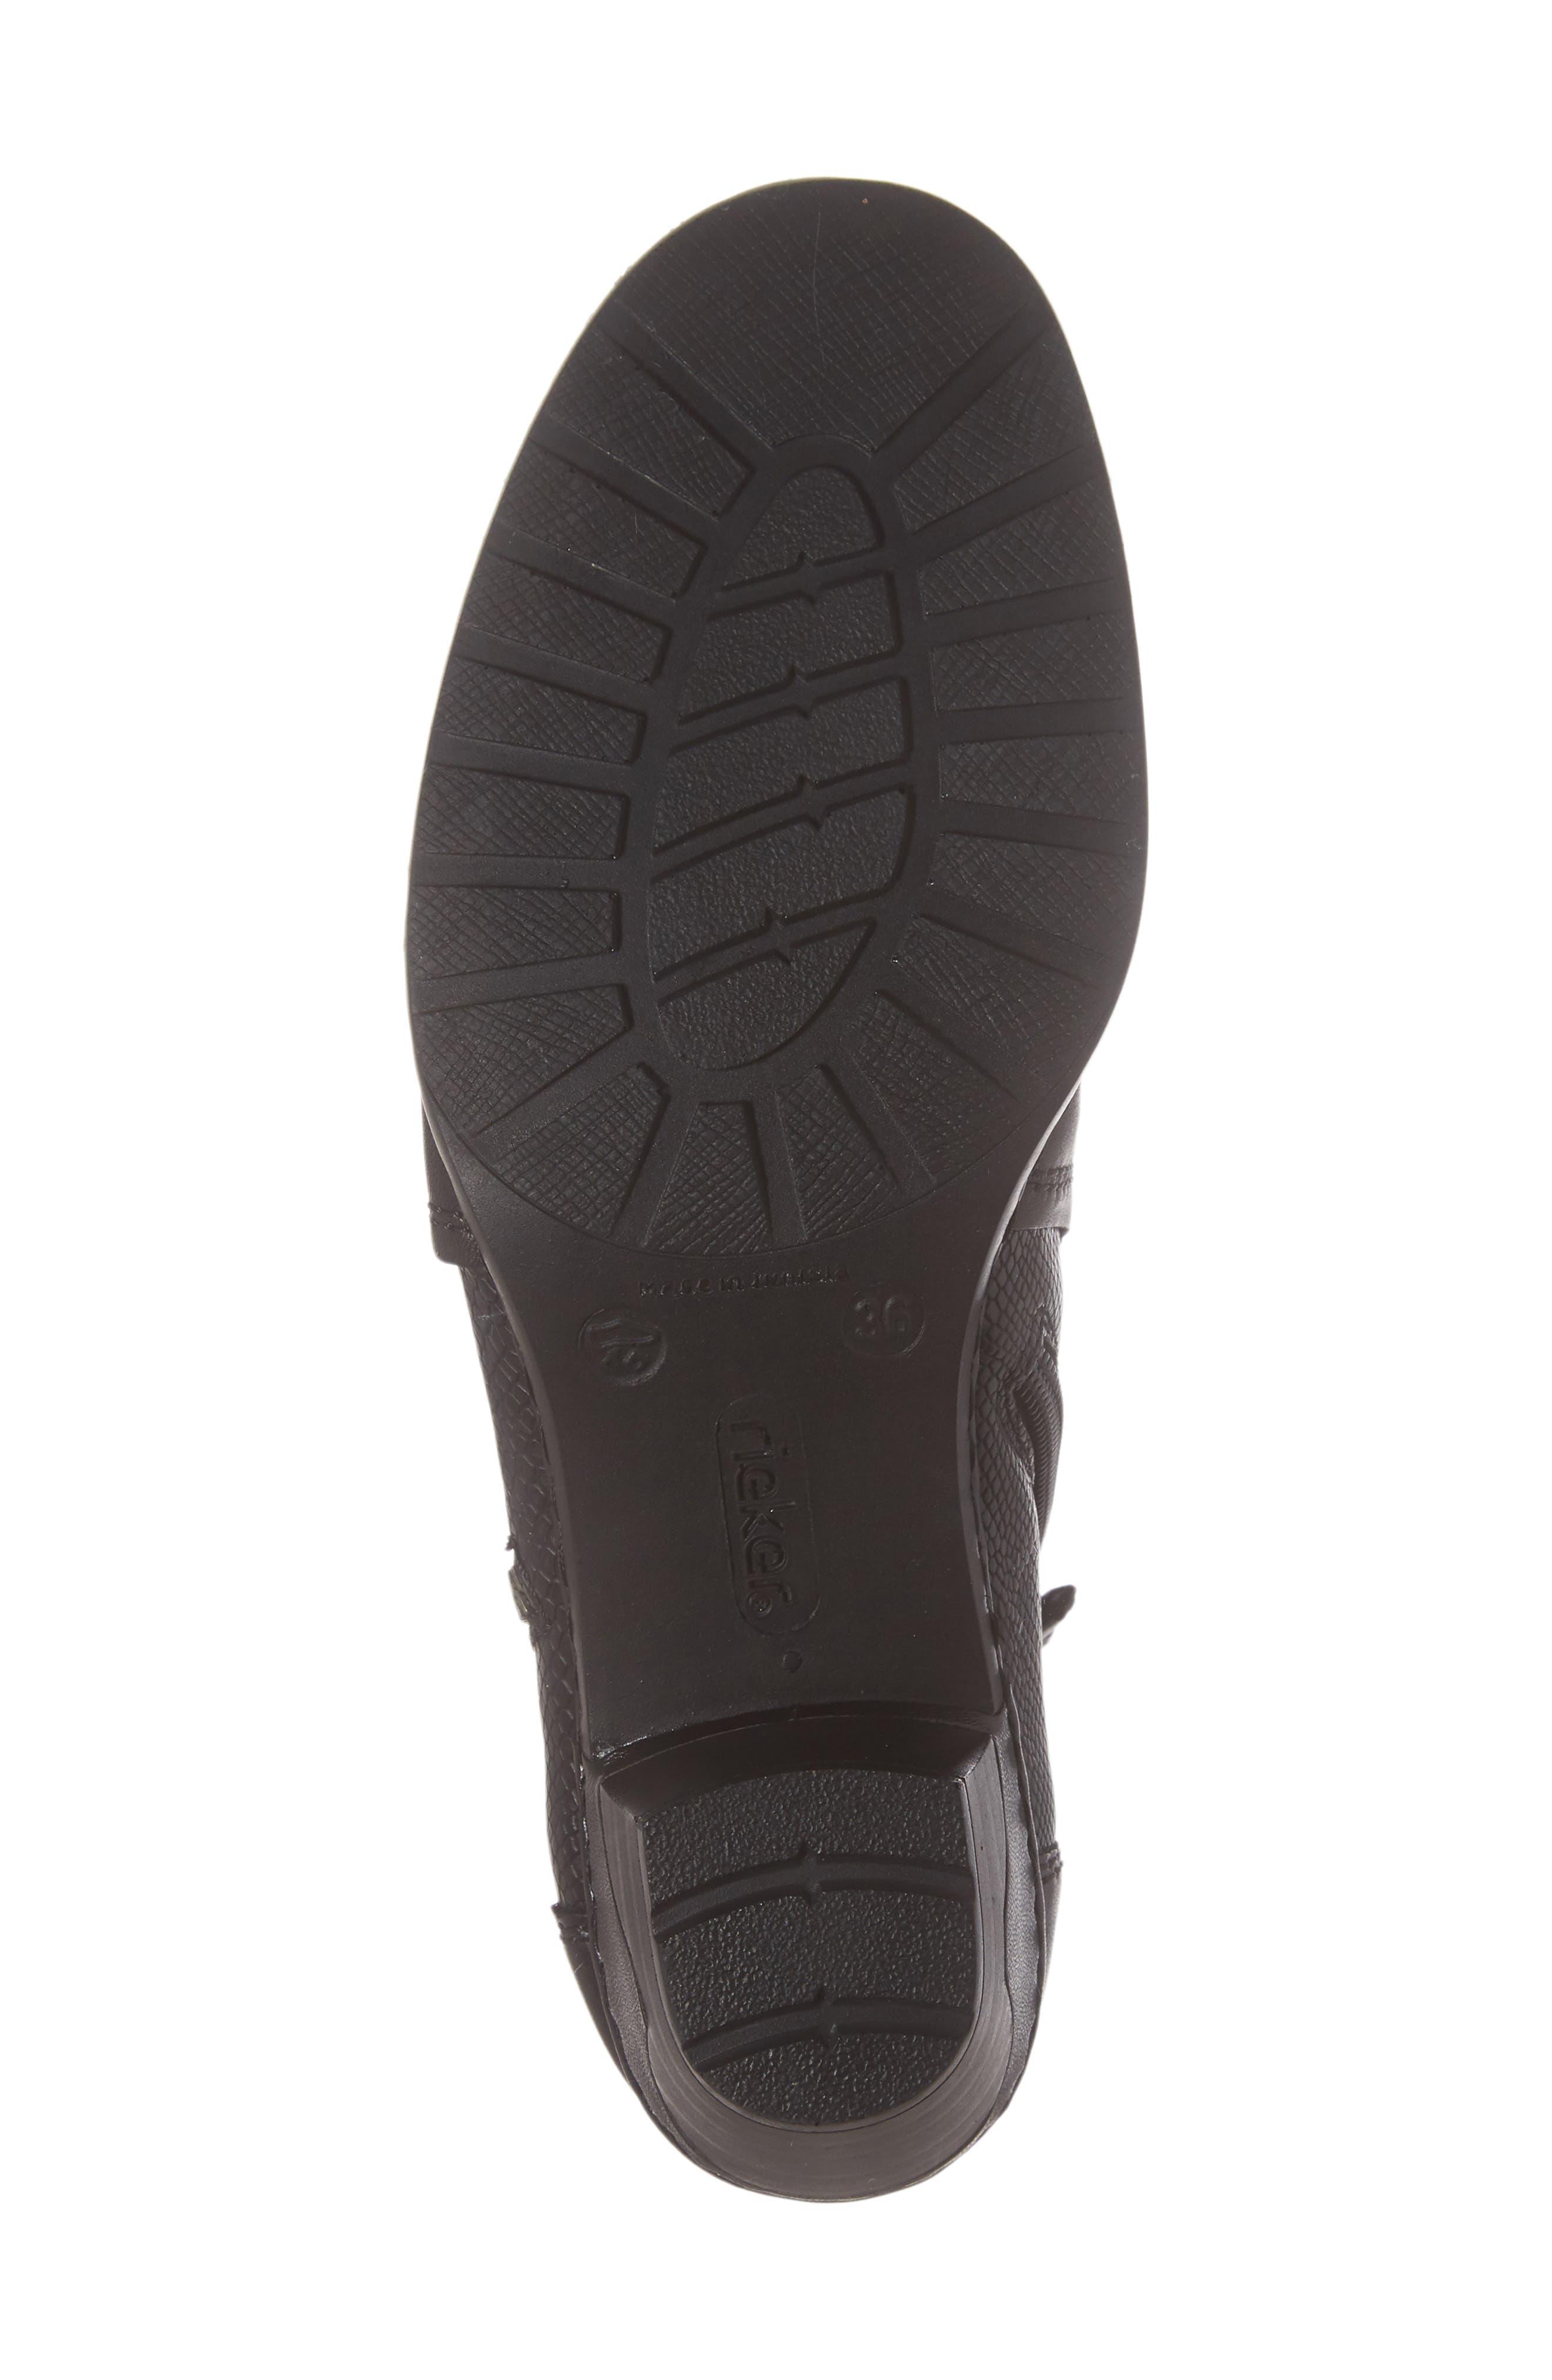 Lynn 62 Bootie,                             Alternate thumbnail 6, color,                             Schwarz Nero Leather